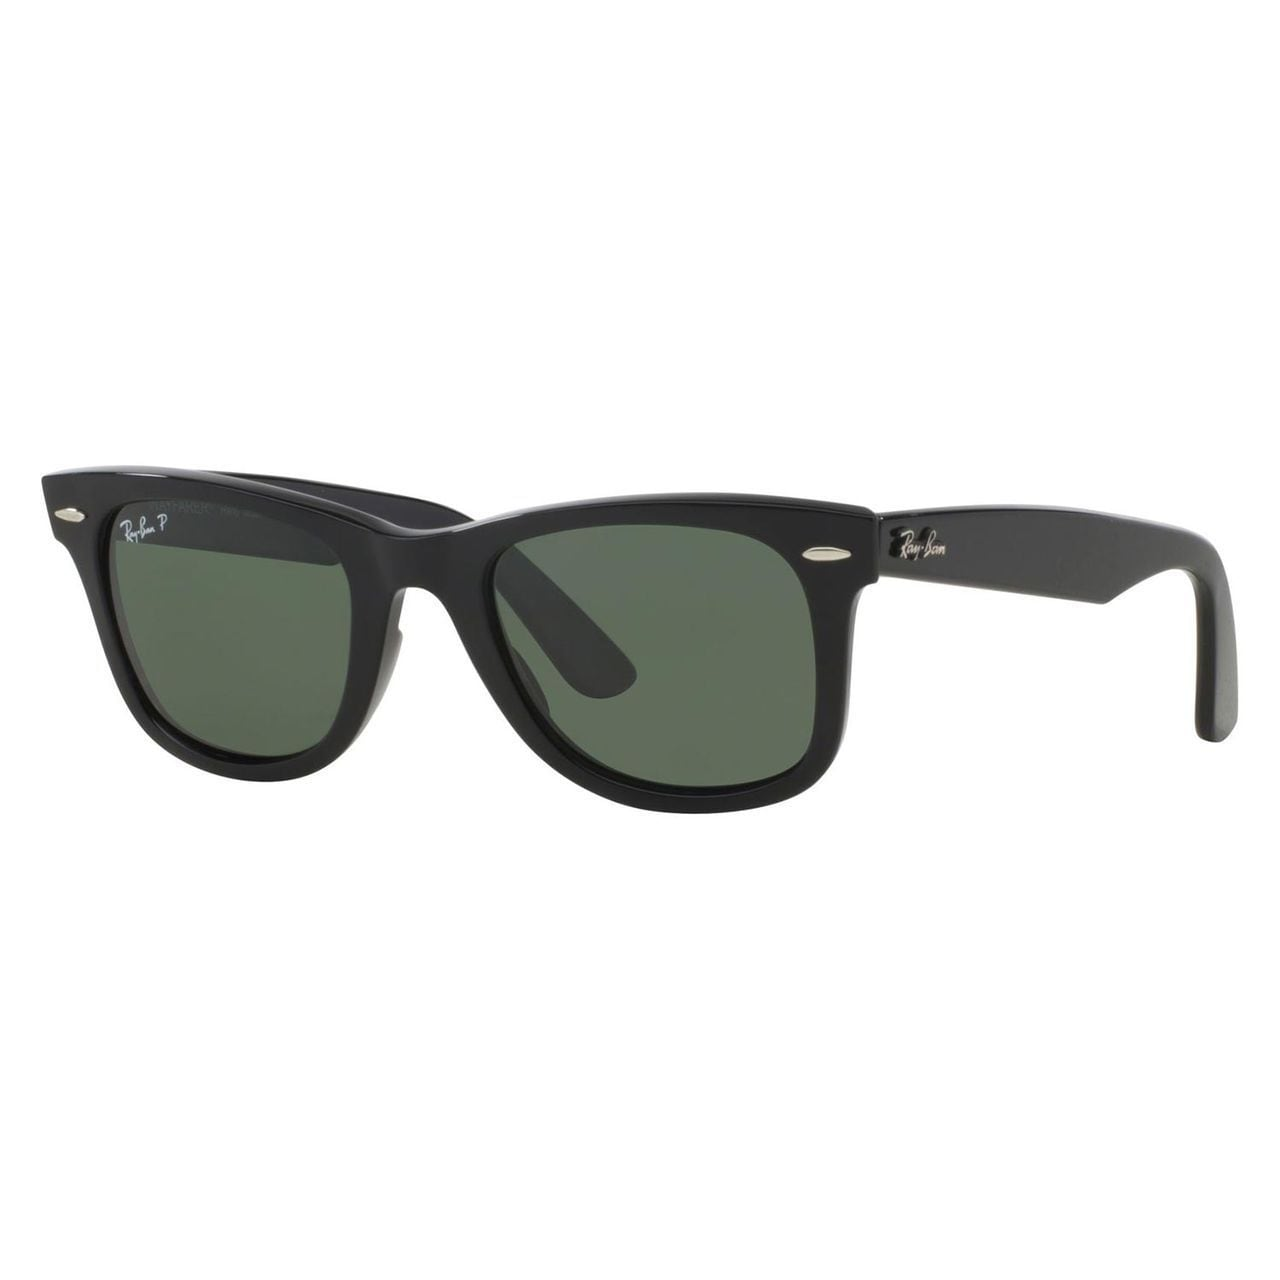 e277d5670aa Ray-Ban RB2140 Original Wayfarer Classic Polarized Sunglasses Black  Green  Classic 54mm - Black